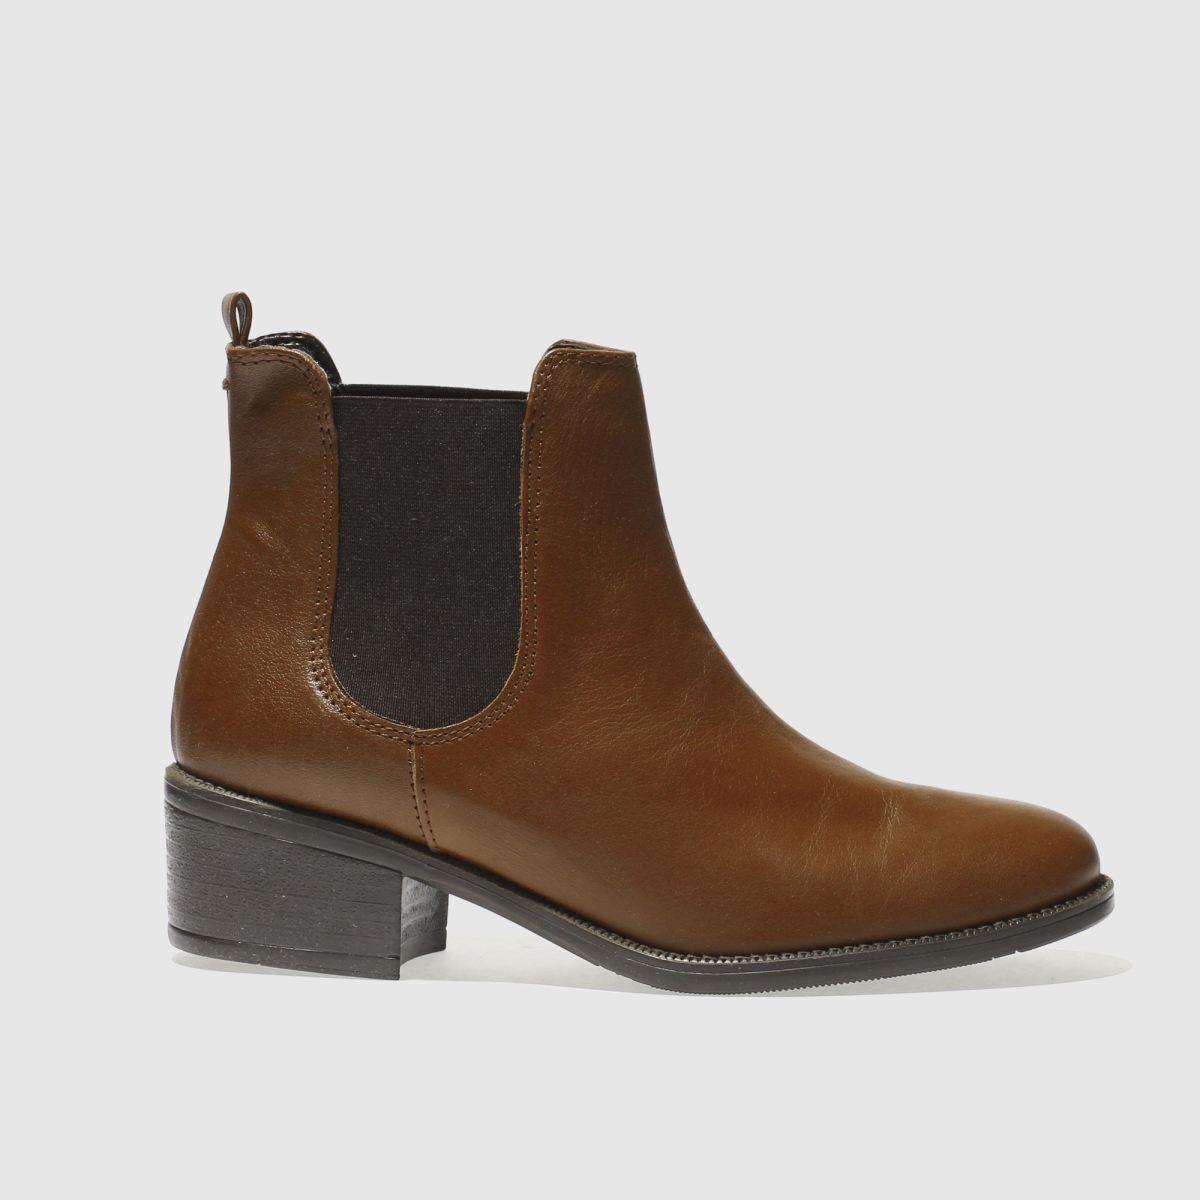 Schuh Tan Vice Boots